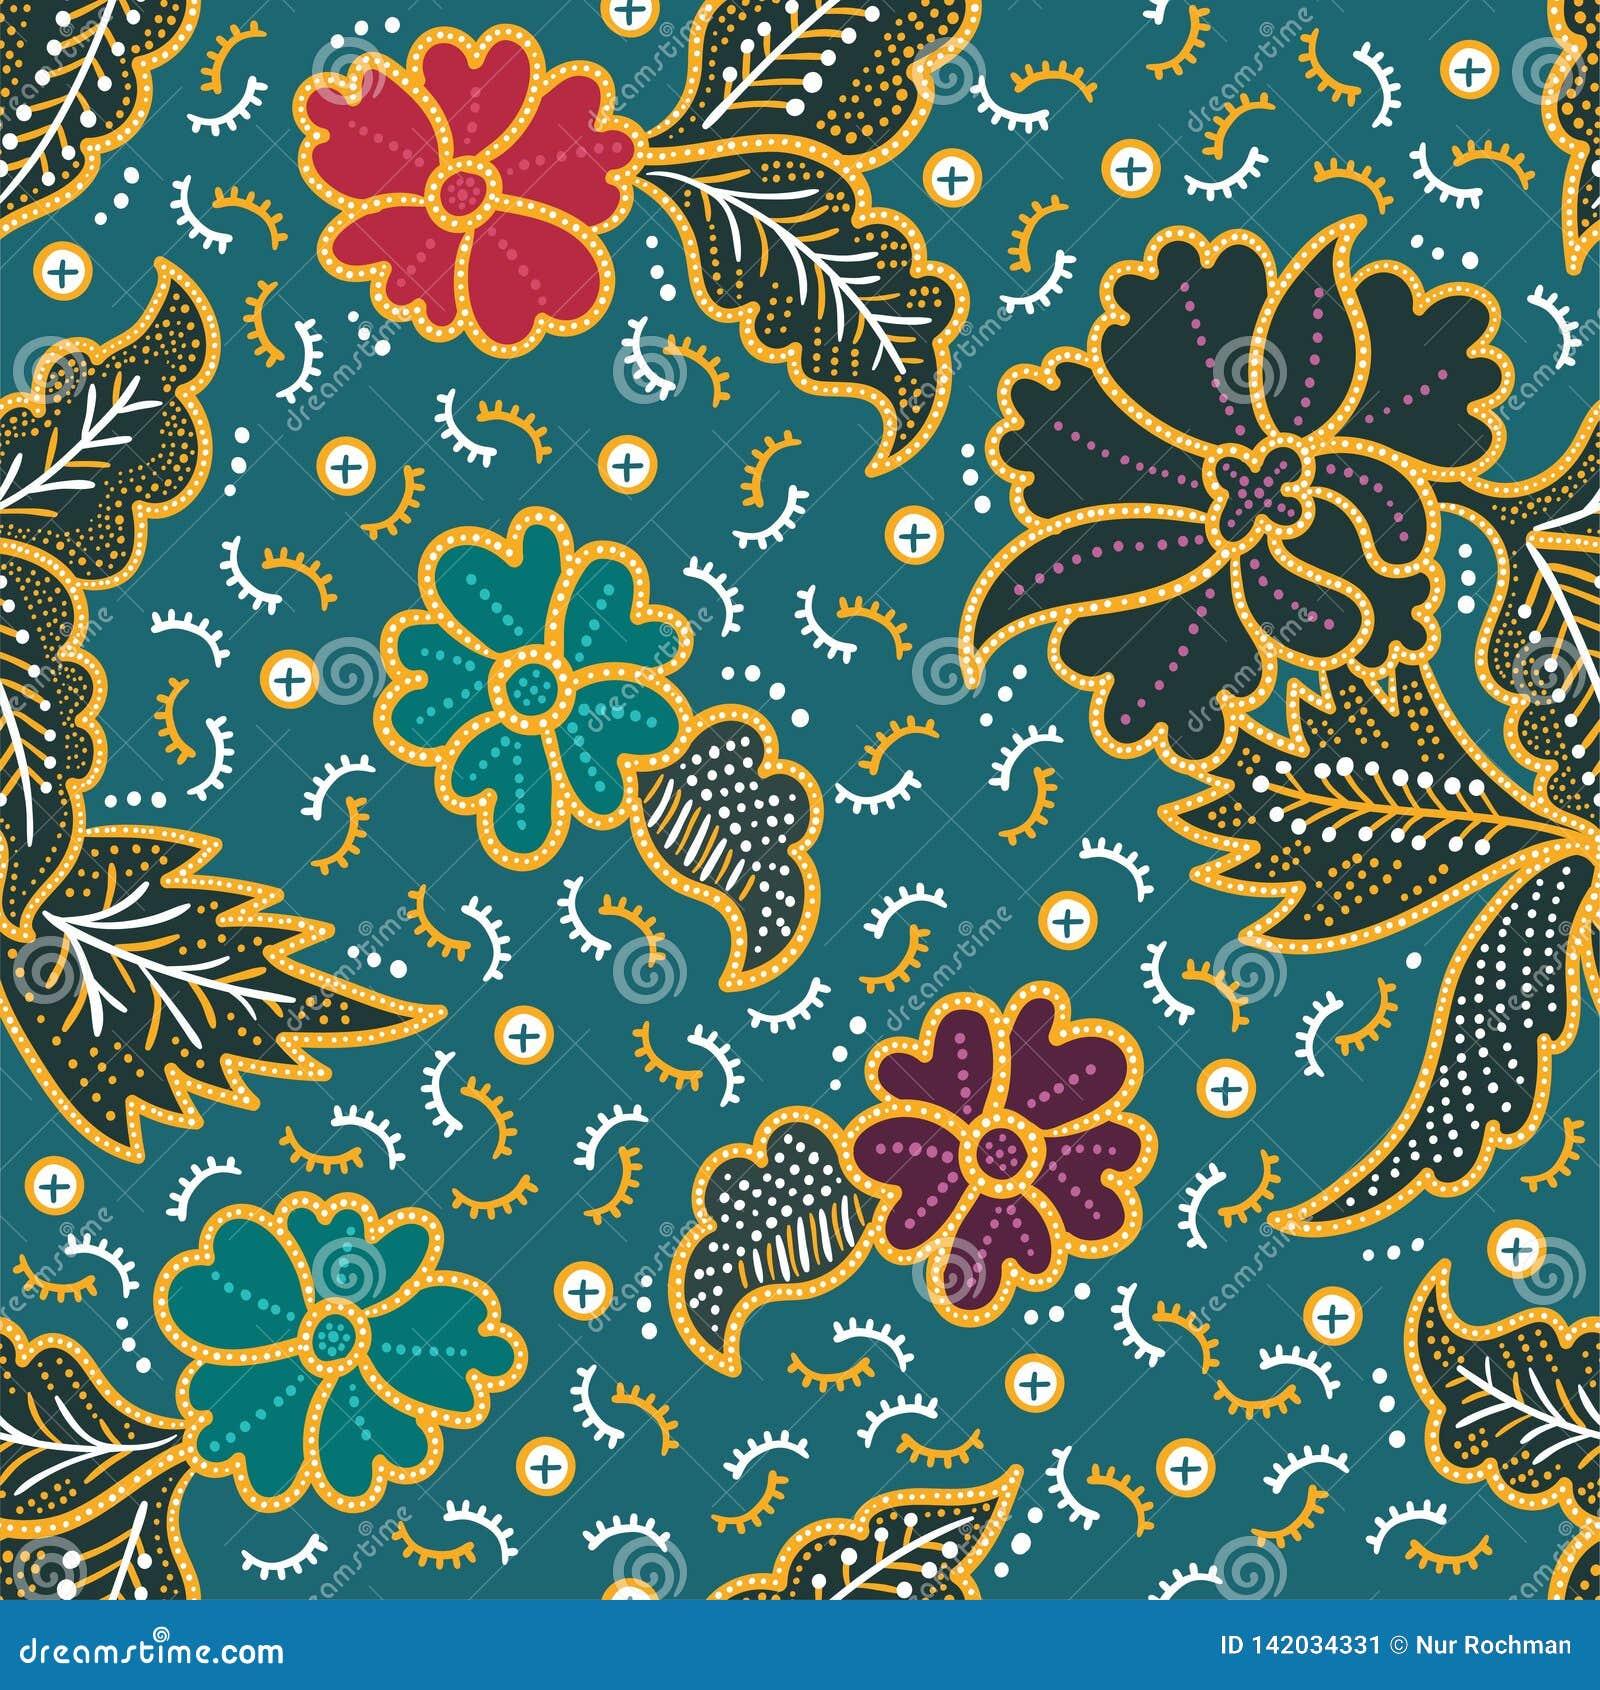 Elegant Floral Batik Seamless Pattern For Printing And